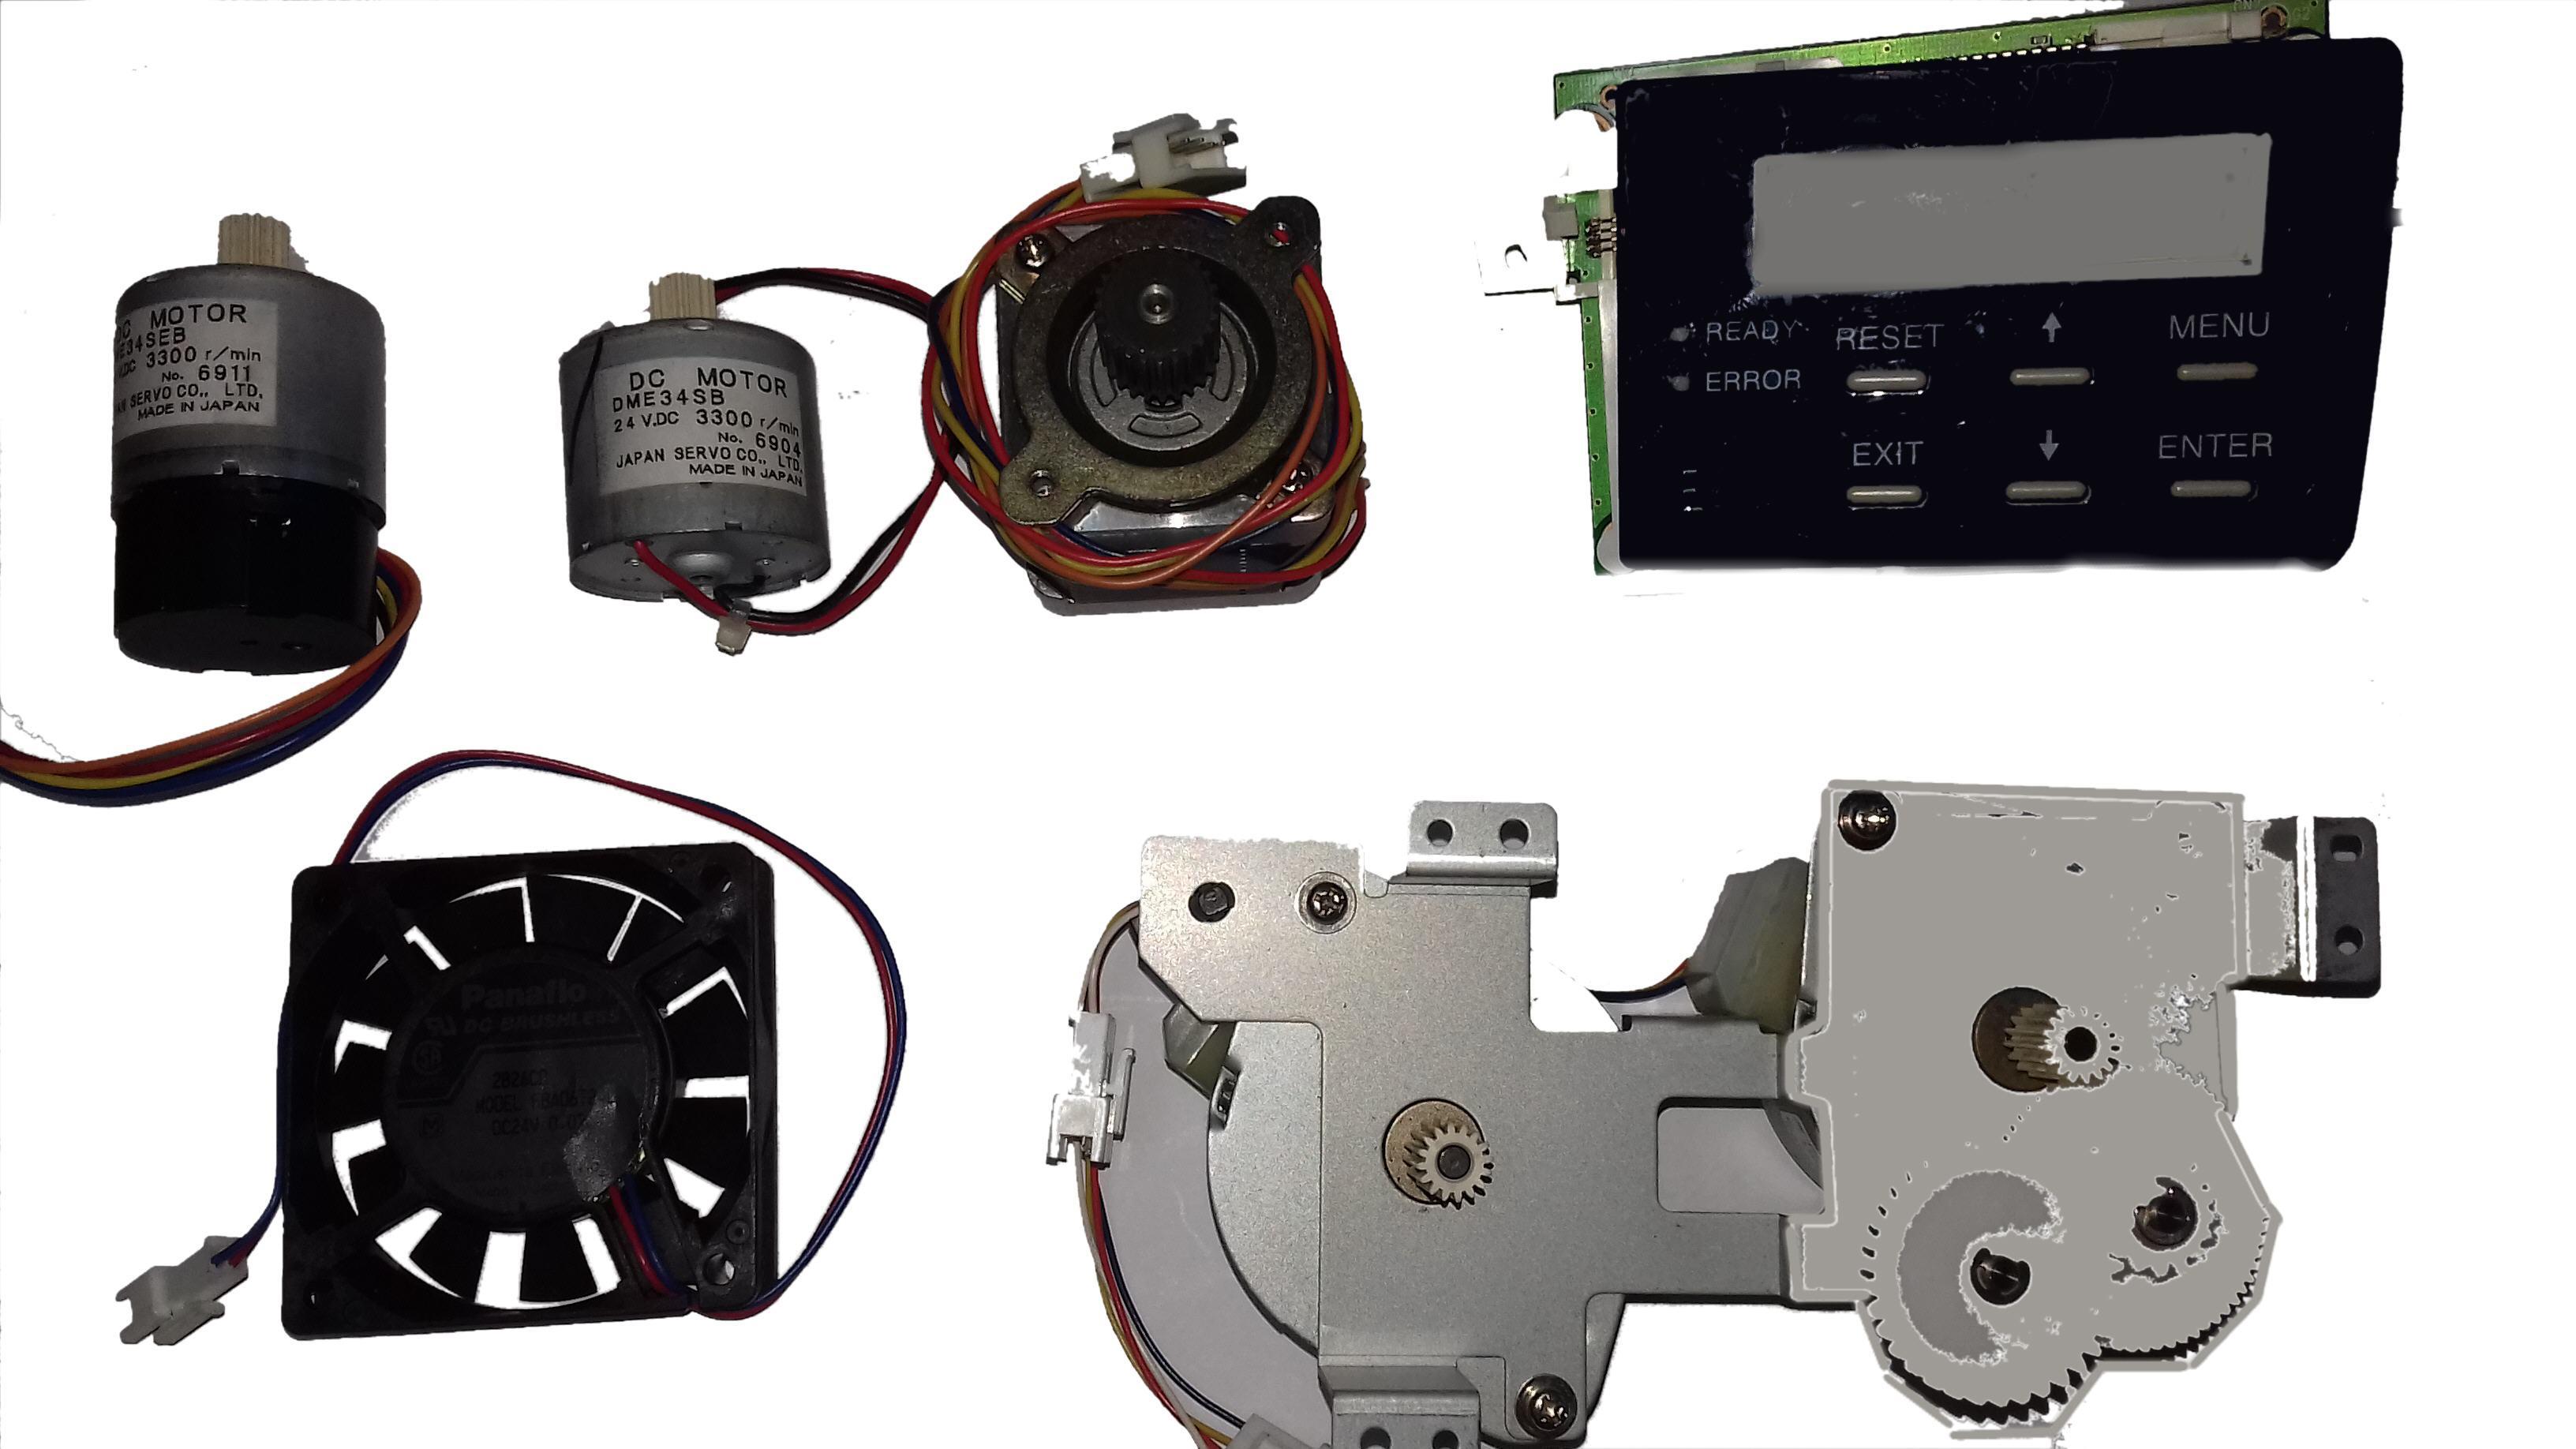 CX330_XID9300_Parts_2.jpg